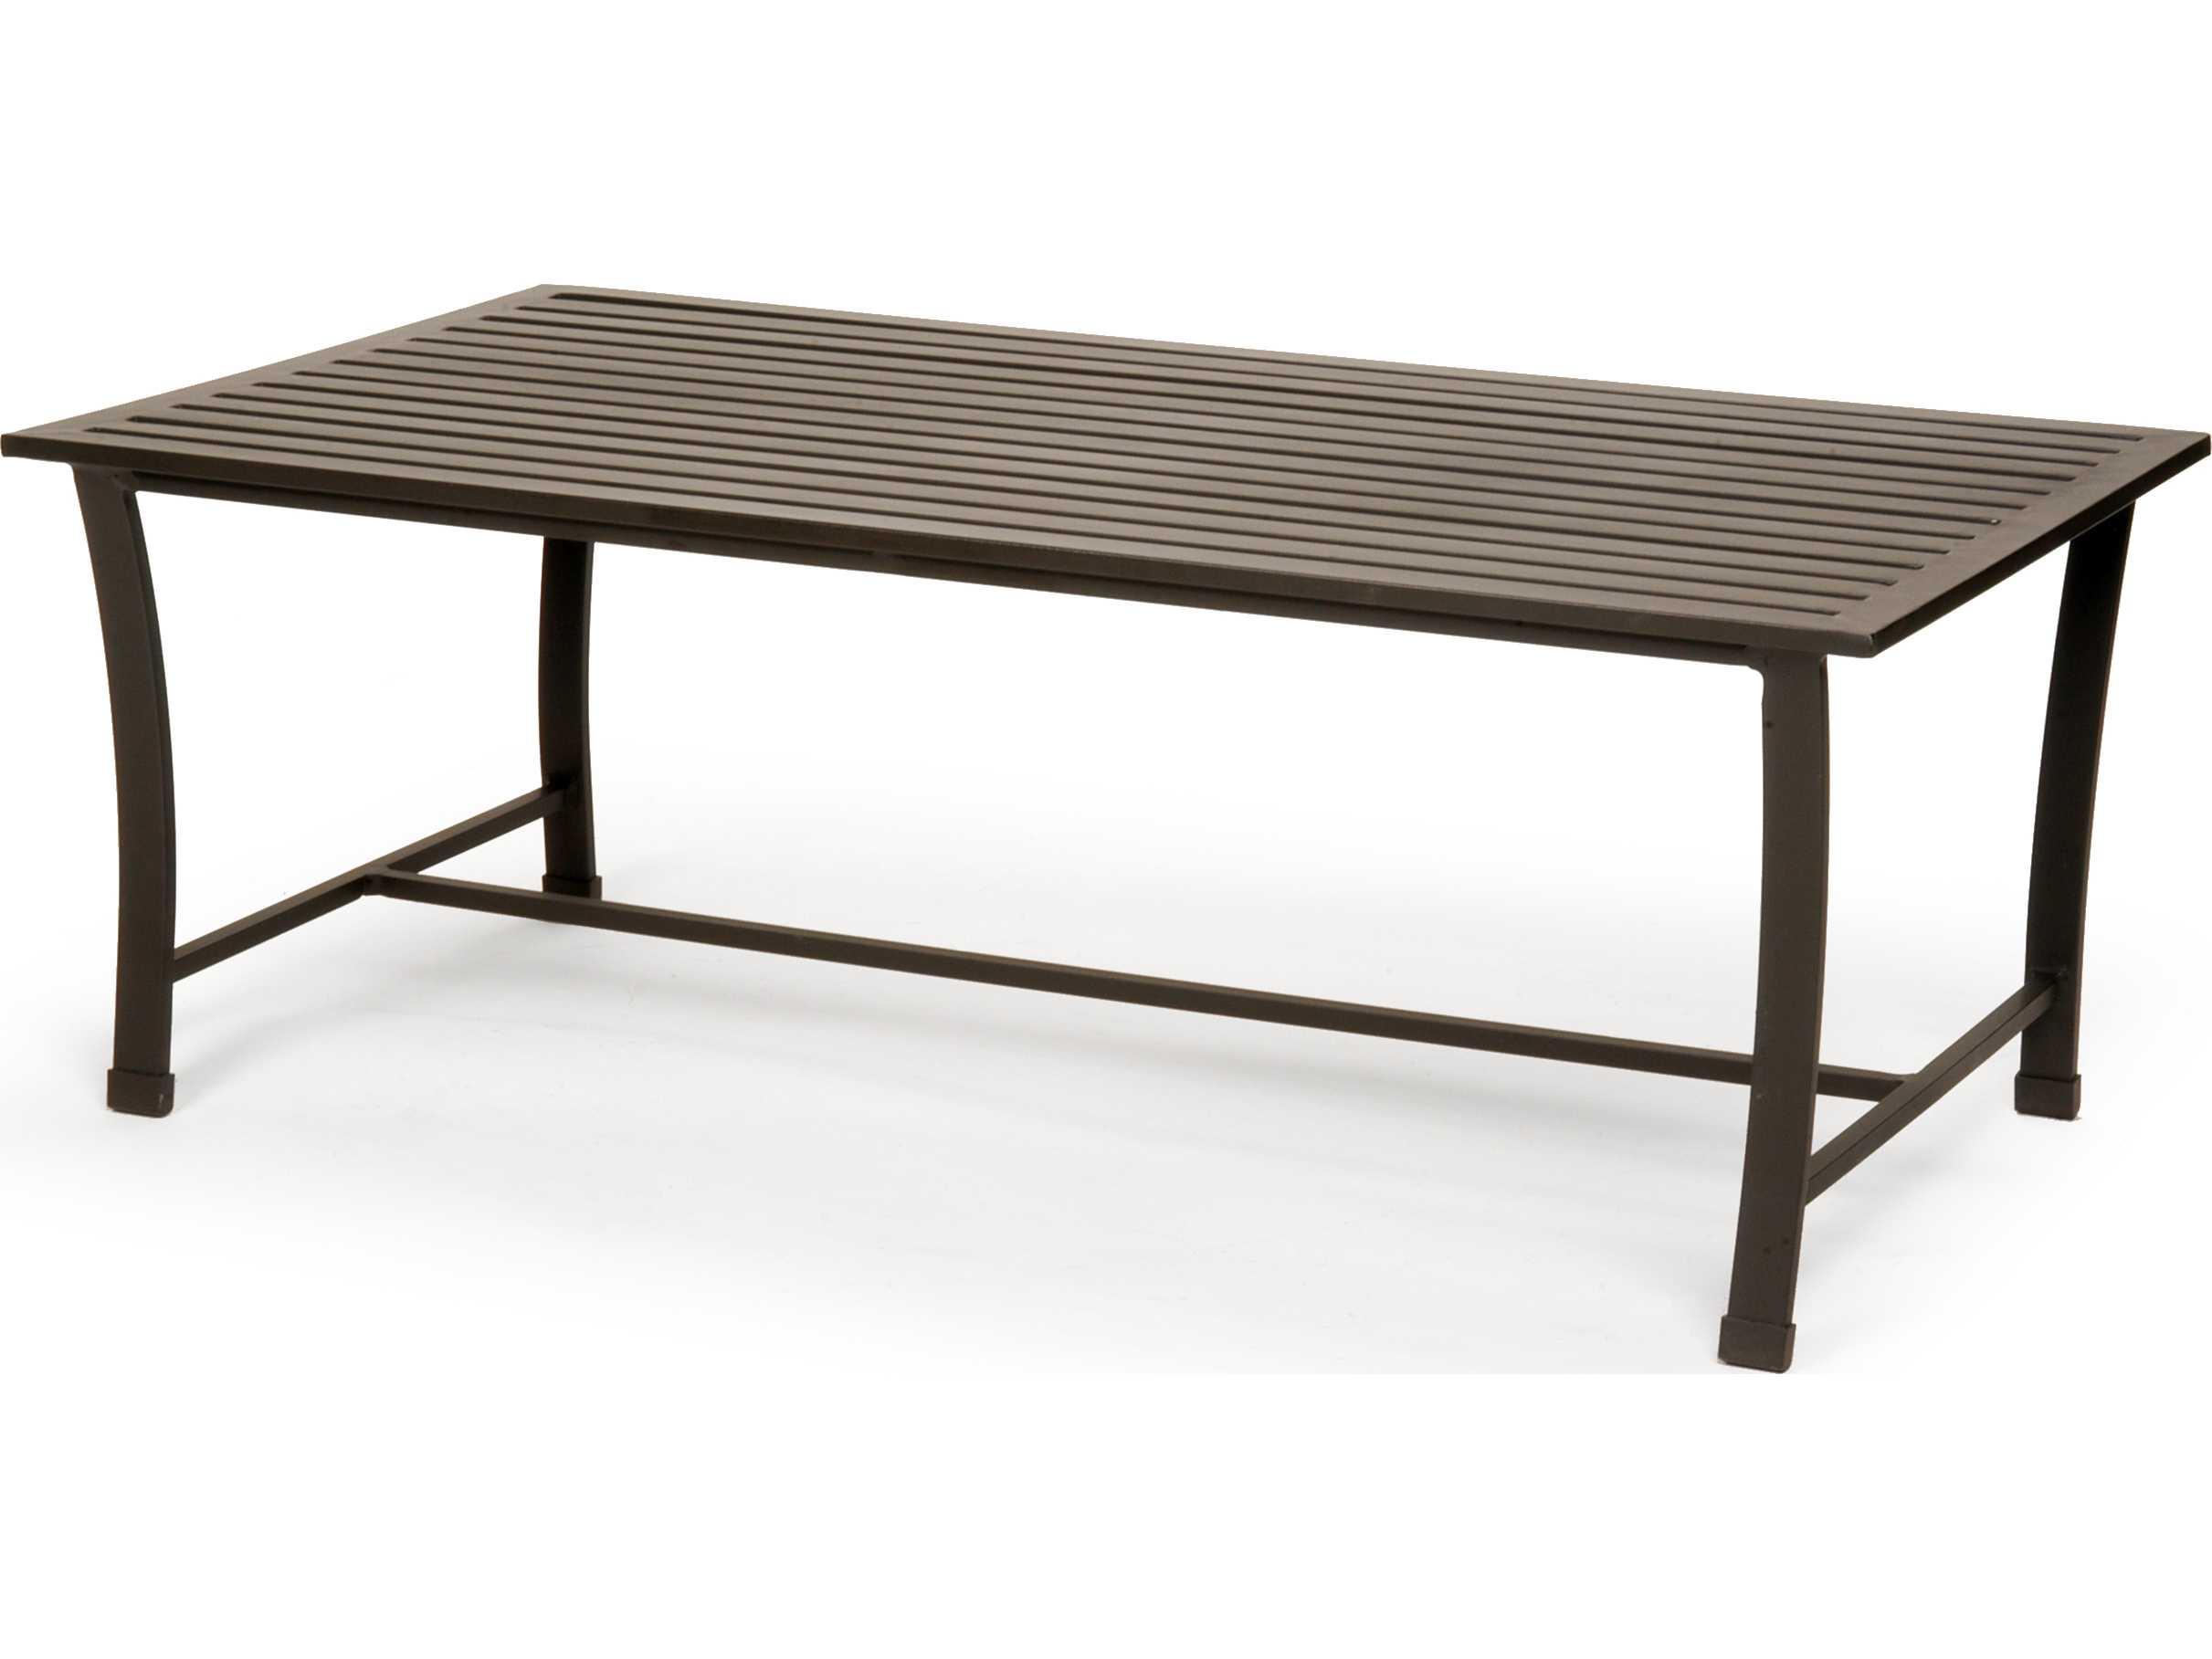 Caluco San Michele Aluminum 44 X 24 Rectangular Metal Coffee Table Cu710f